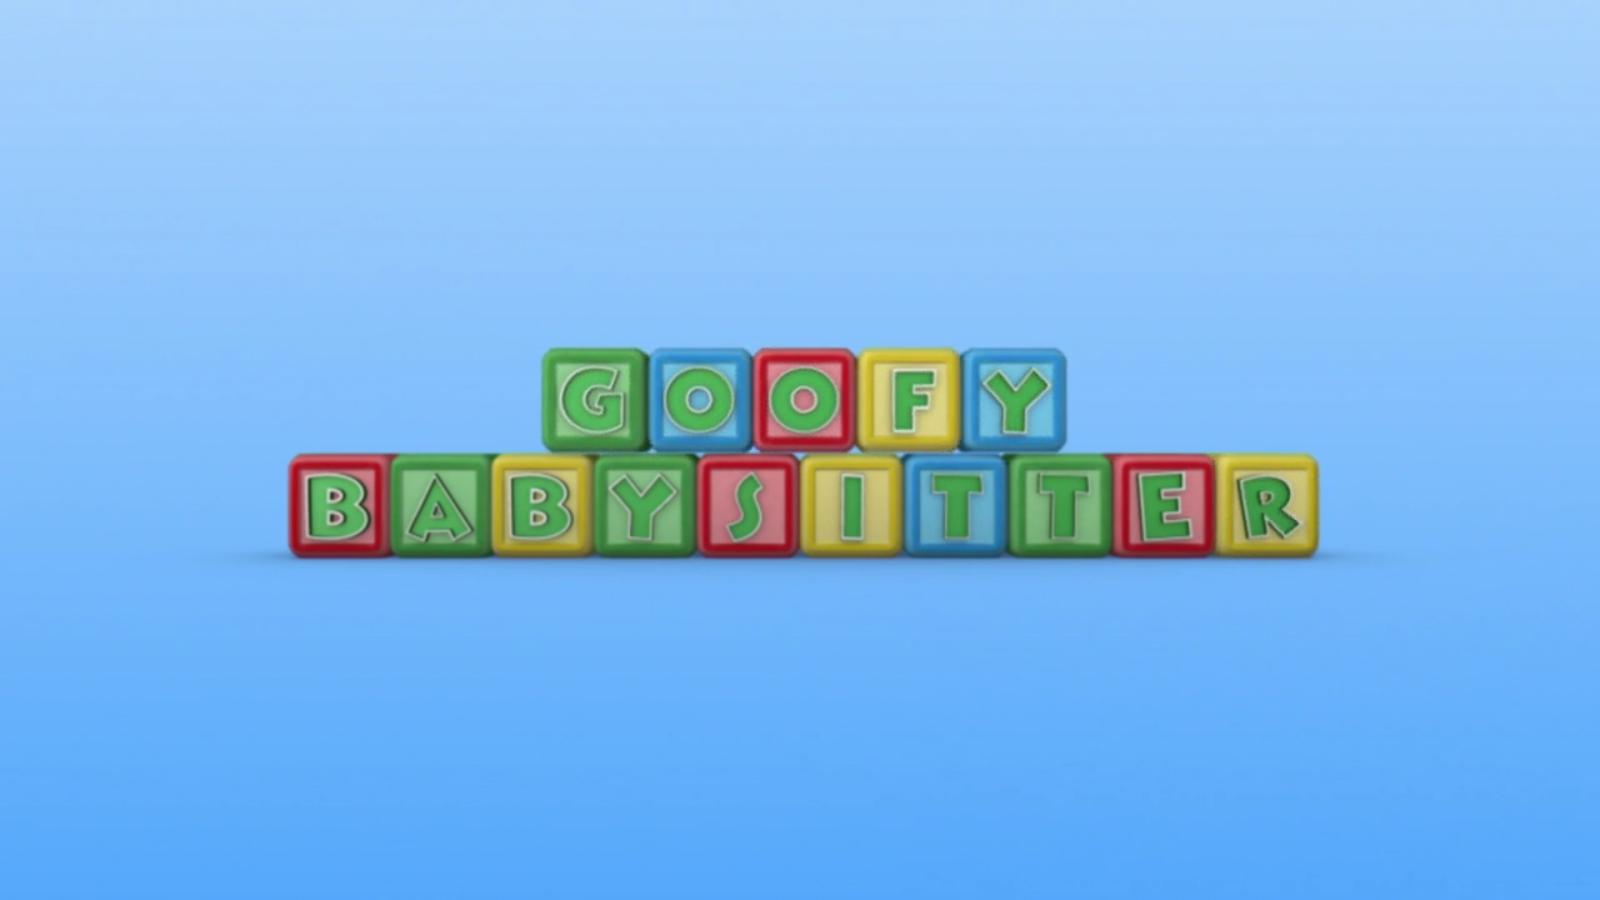 Goofy Babysitter